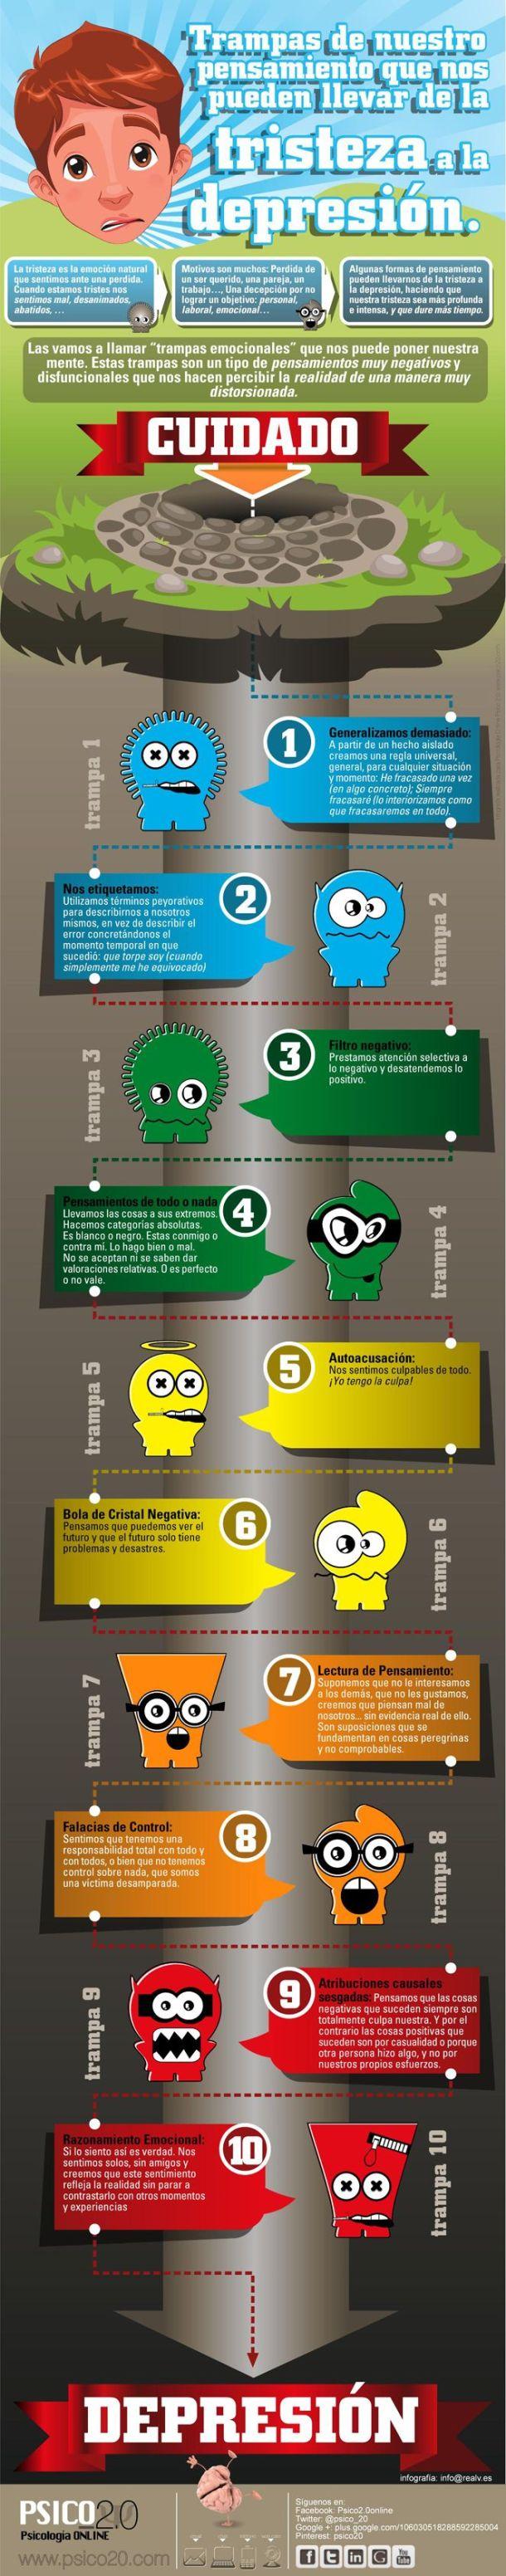 infografia sobre la depresion